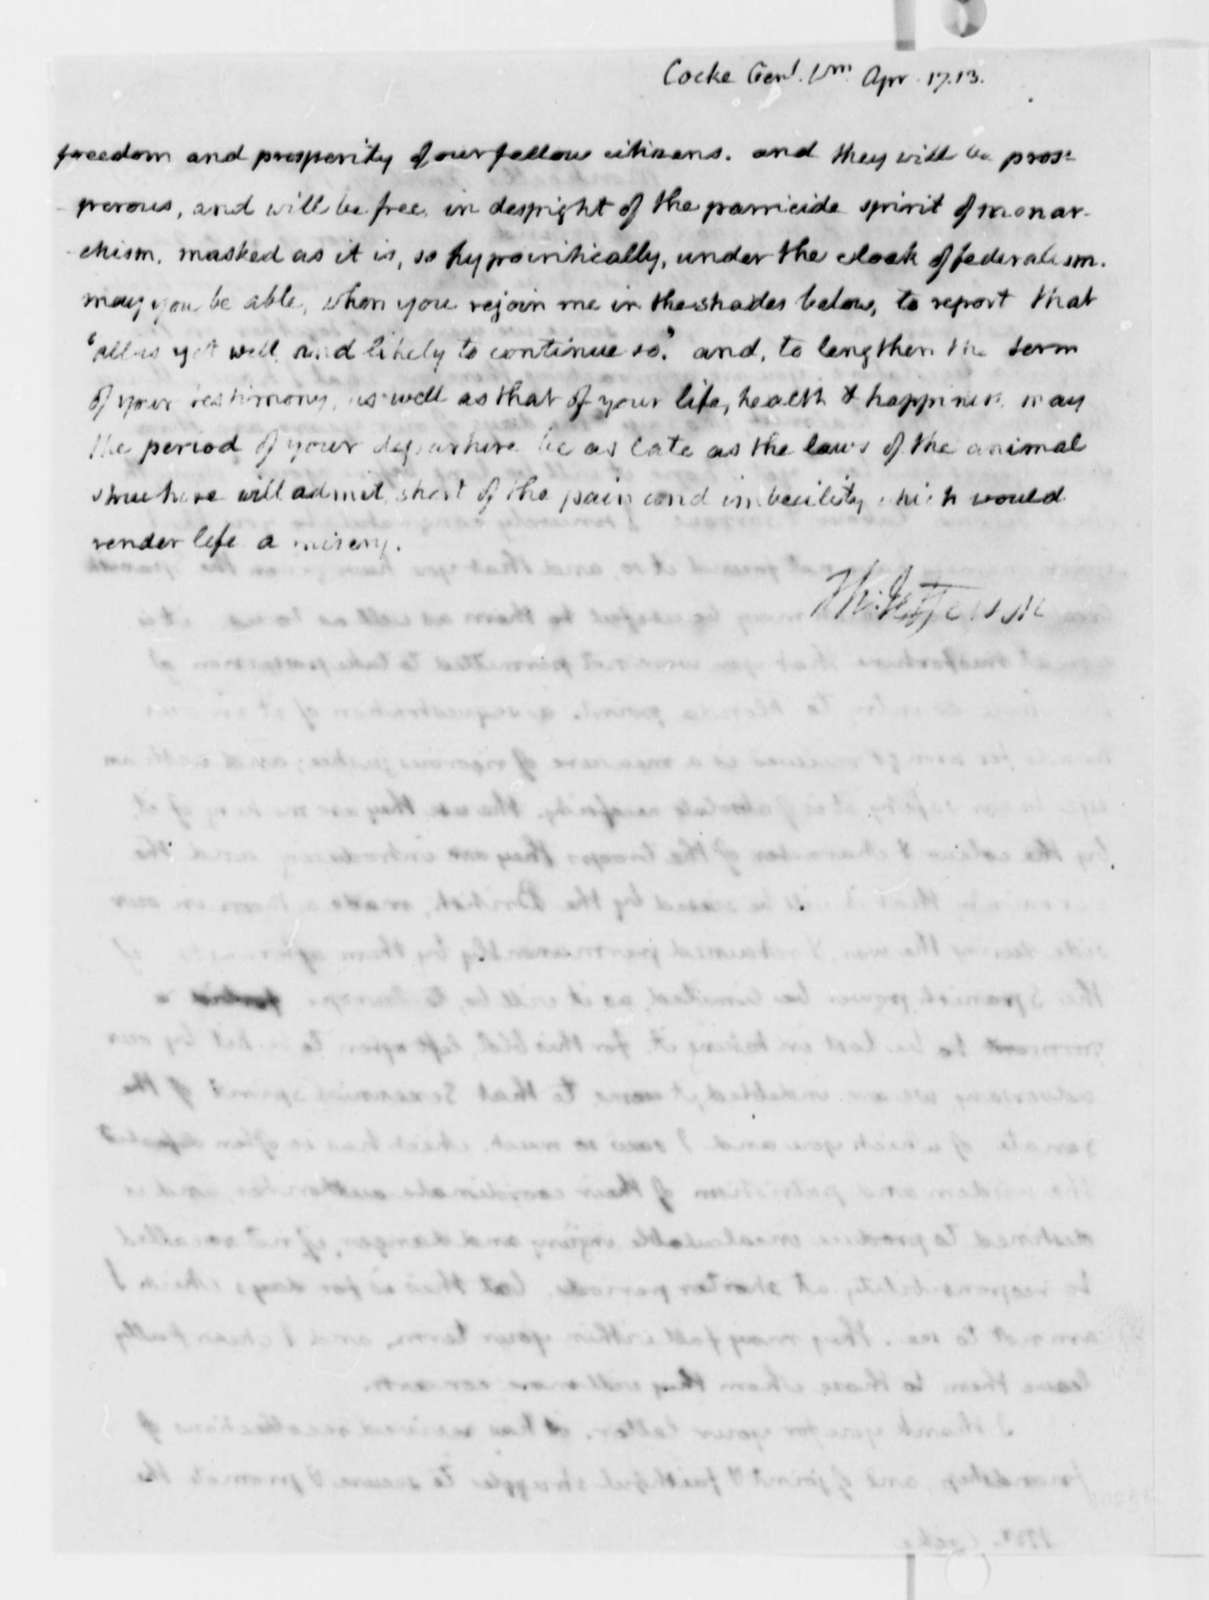 Thomas Jefferson to William Cocke, April 17, 1813